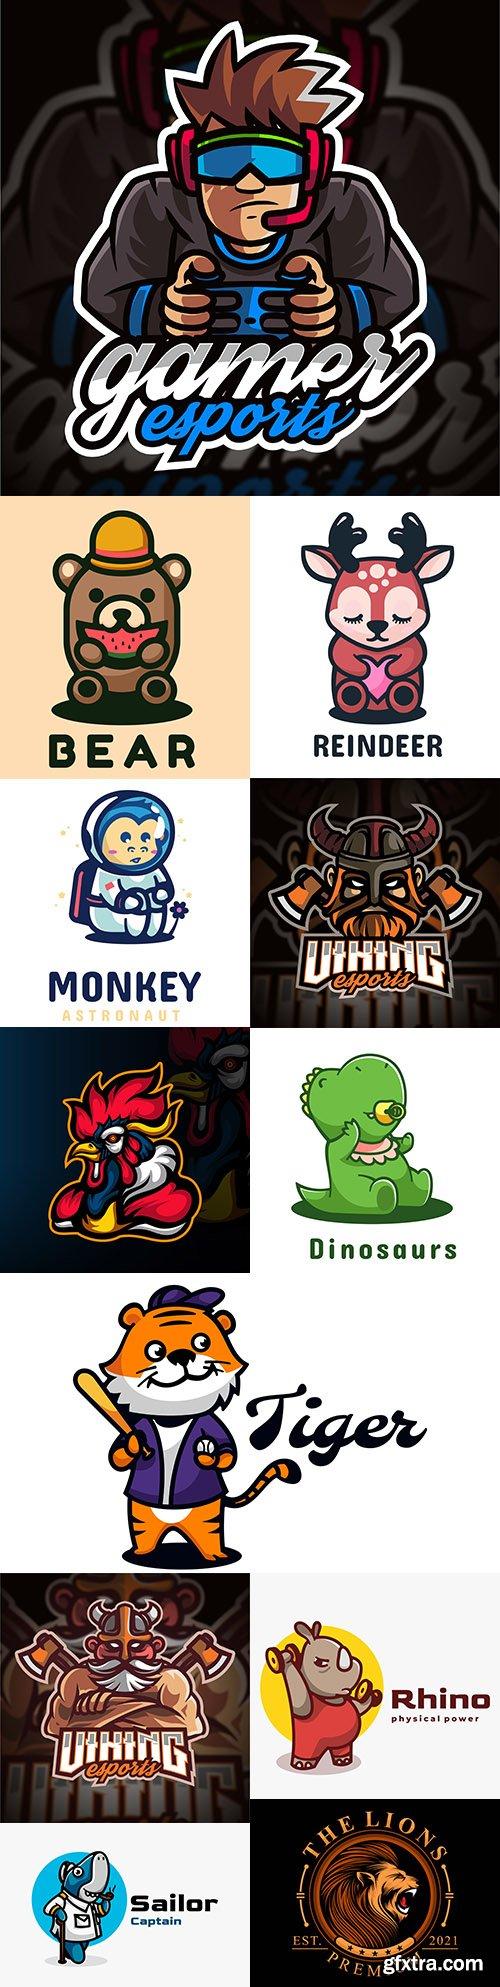 Mascot emblem and brand name logos design 2